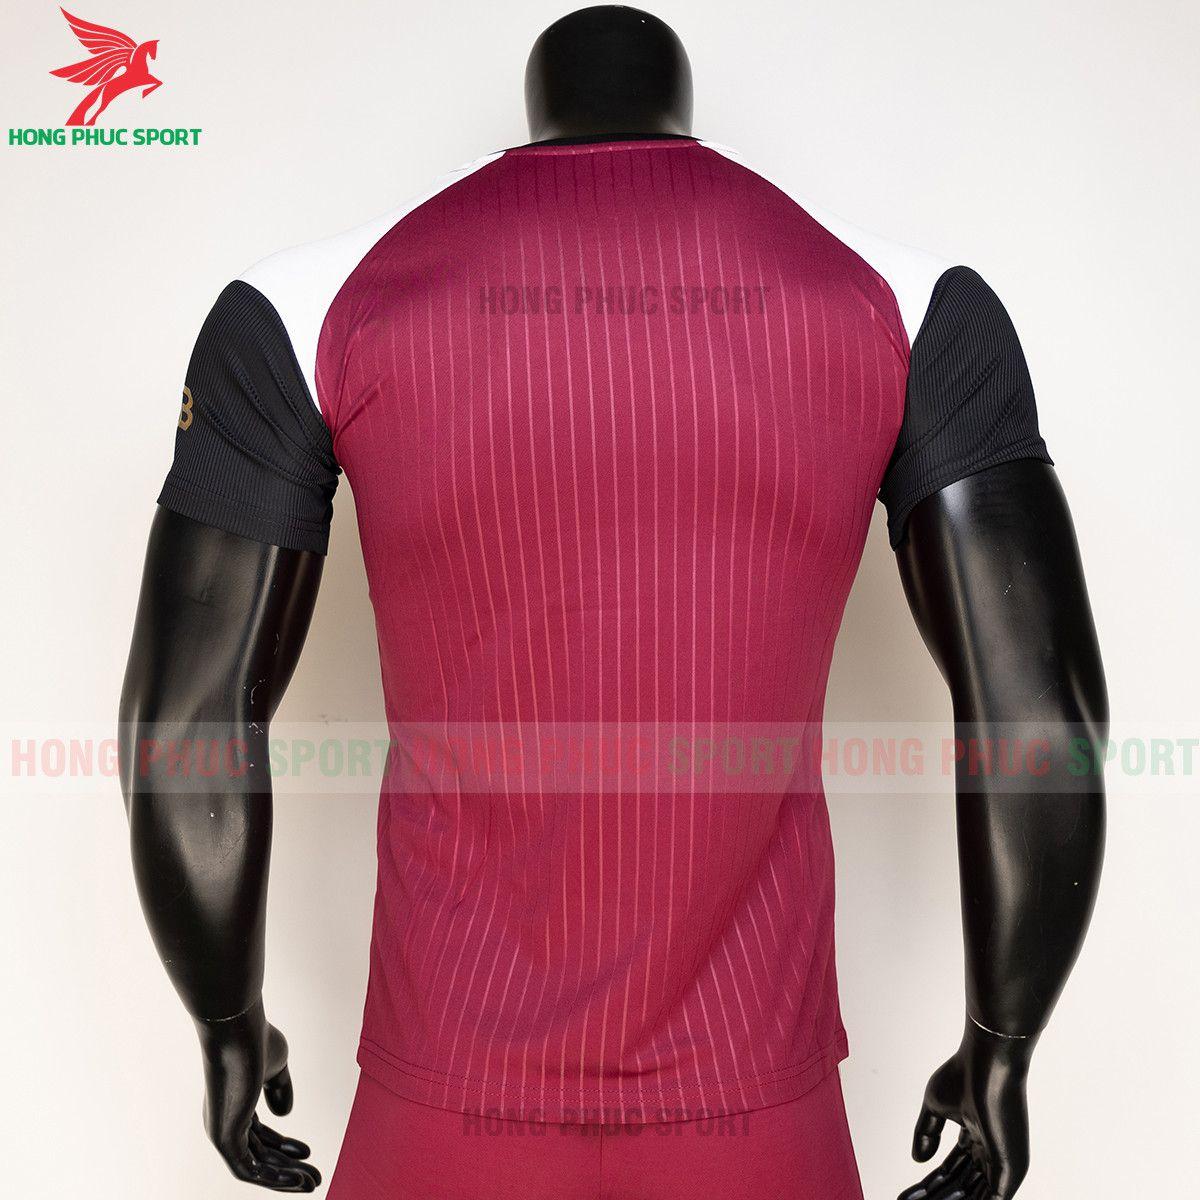 https://cdn.hongphucsport.com/unsafe/s4.shopbay.vn/files/285/ao-bong-da-psg-2020-21-mau-thu-3-thailand-1-61559799df49b.jpg